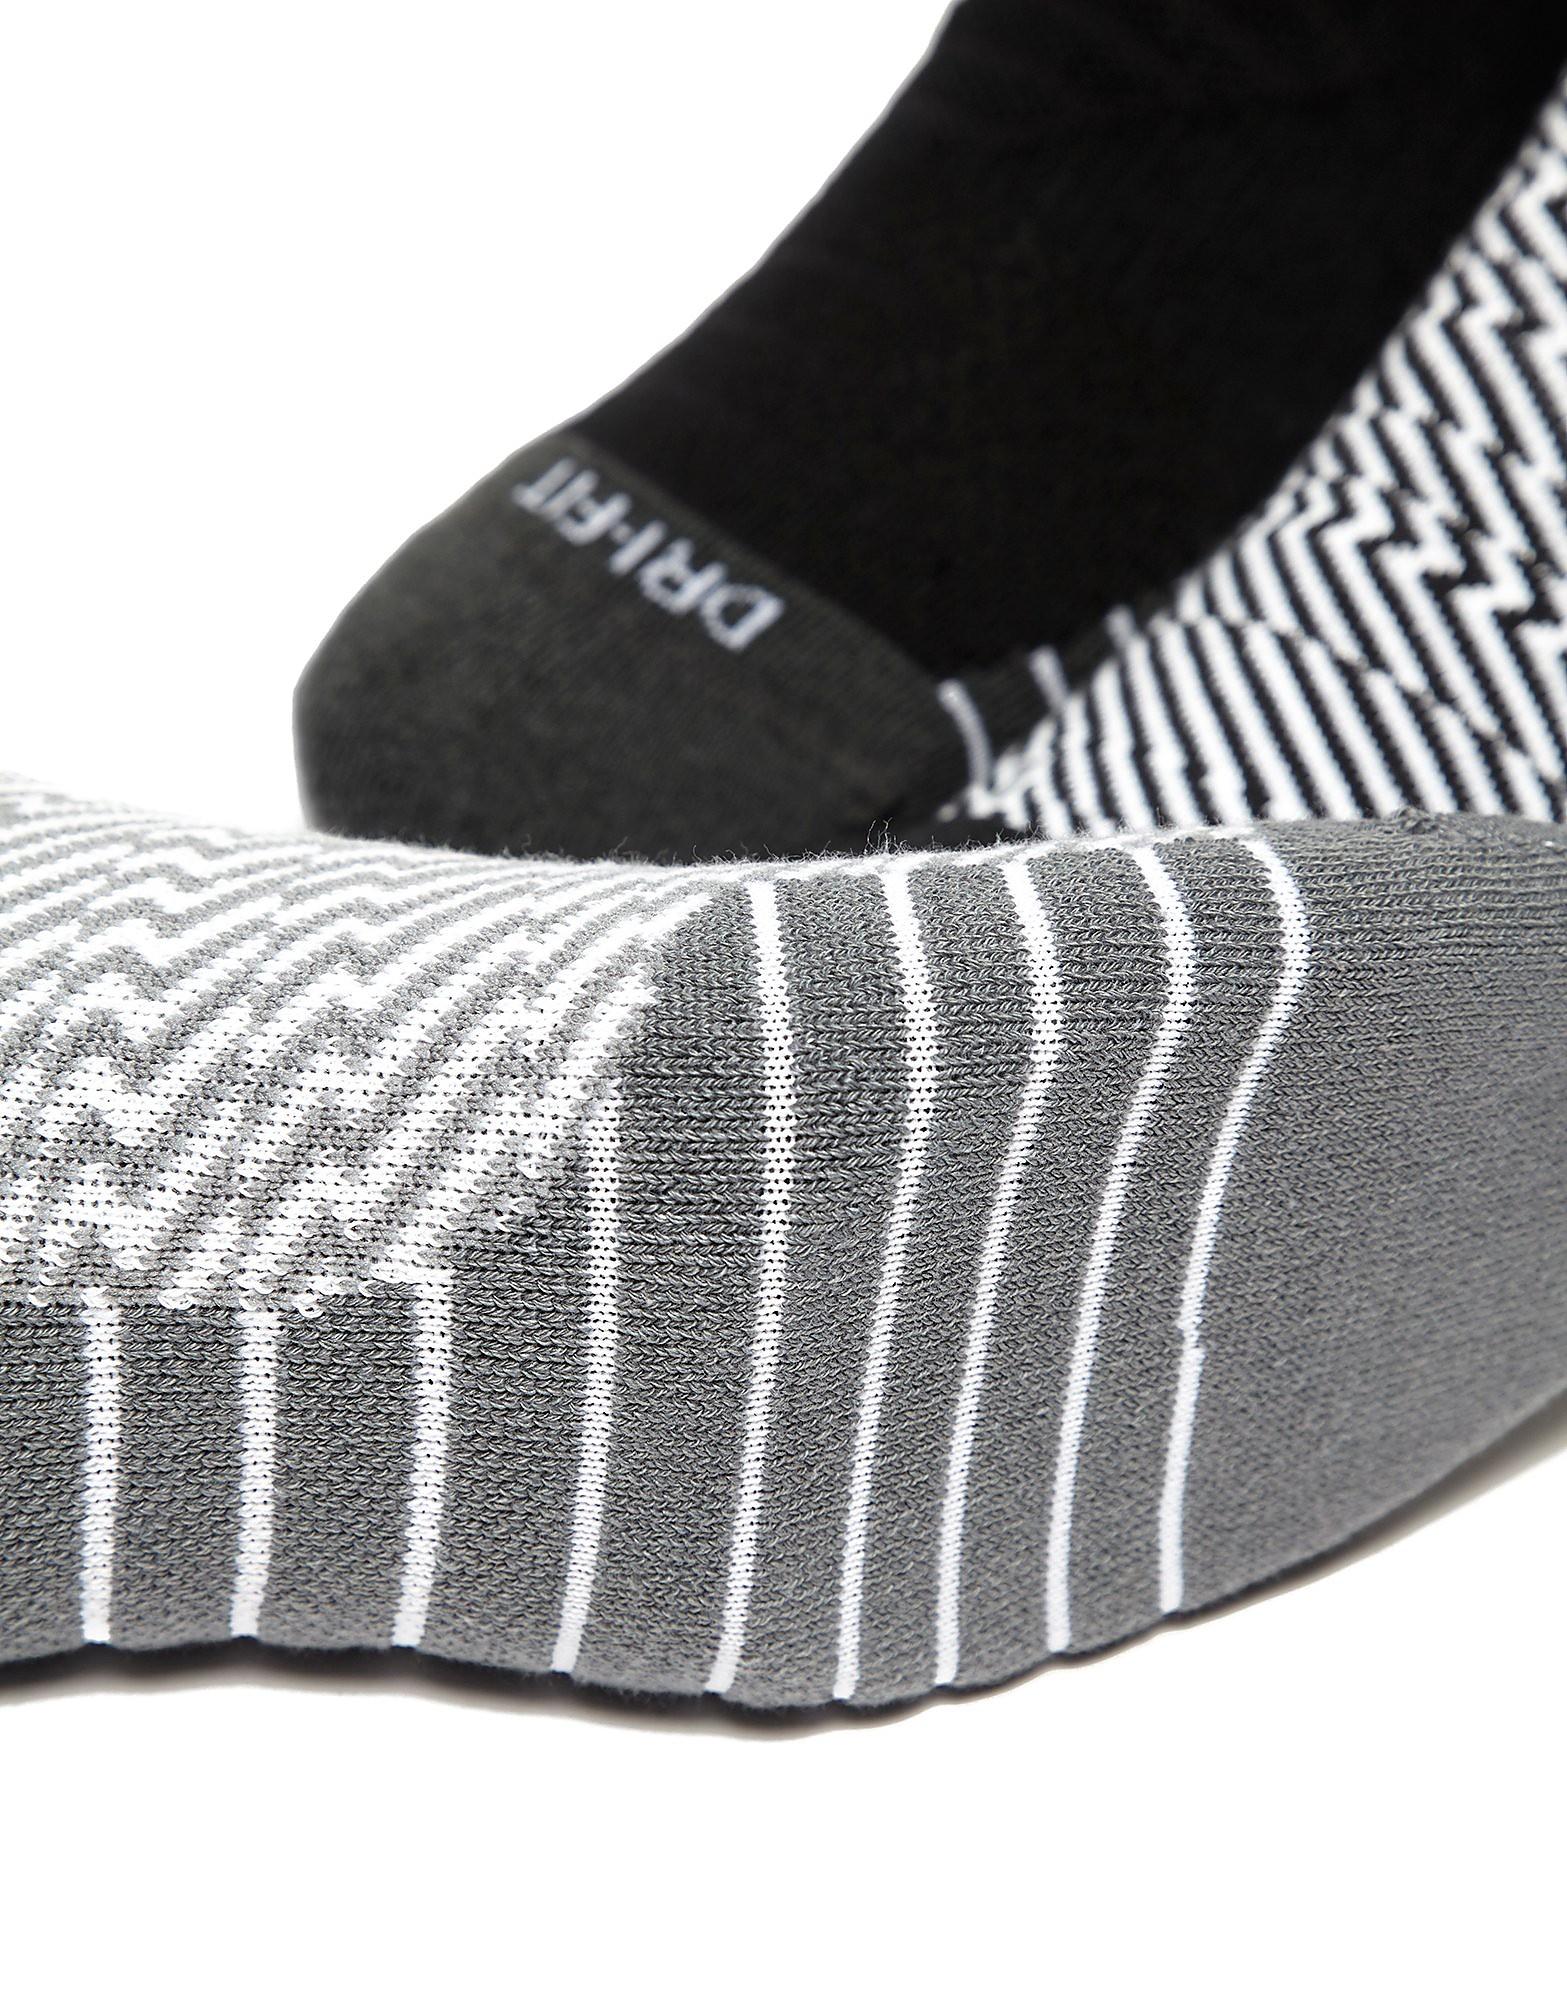 Nike Dry Cushion GFX Training Socks